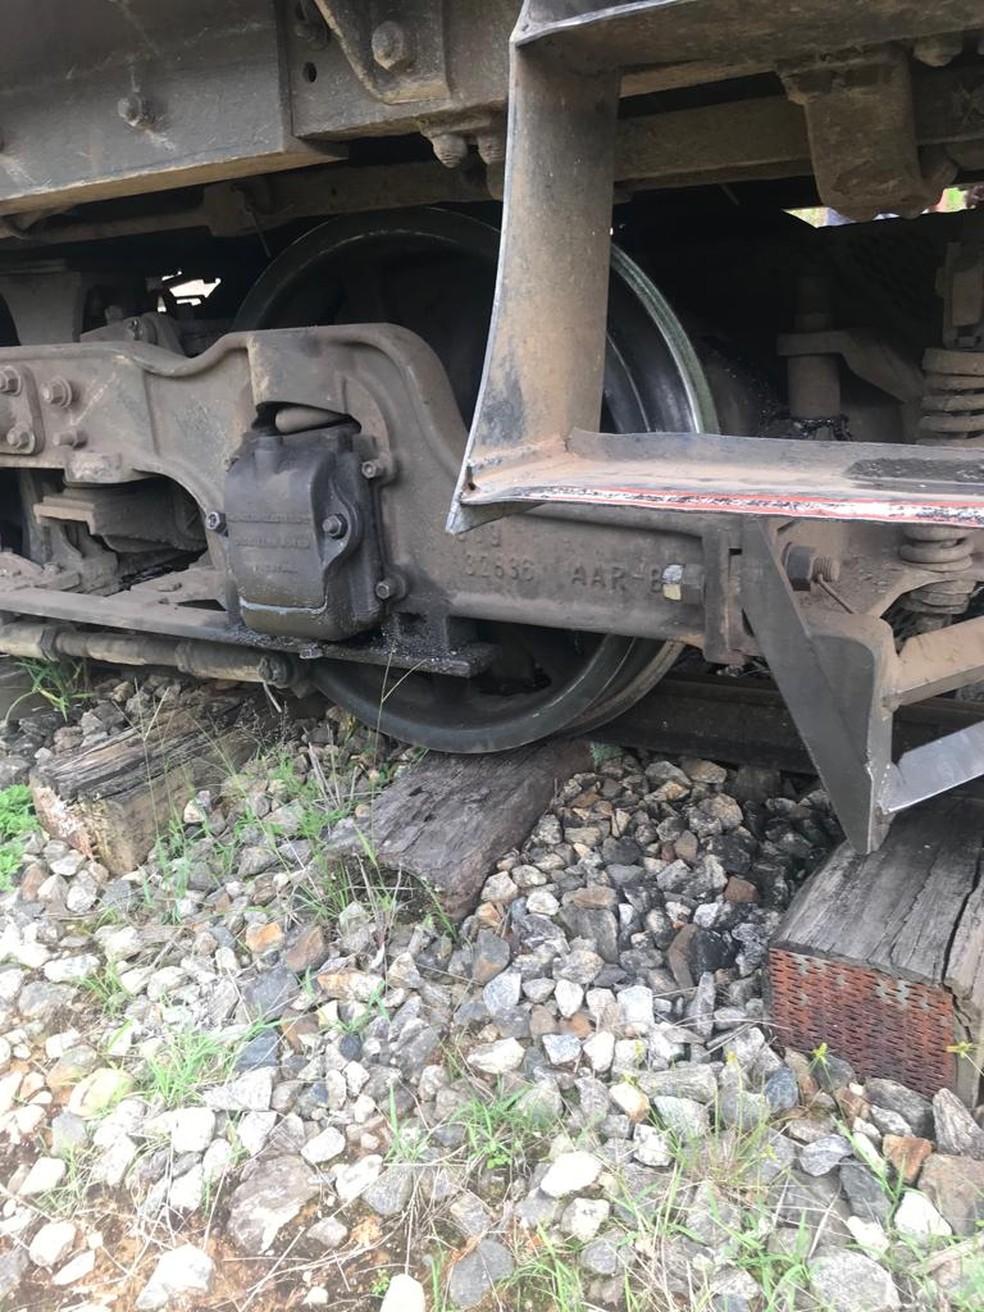 Trem descarrilou durante passeio neste domingo — Foto: Priscila Sassaki/Vanguarda Repórter